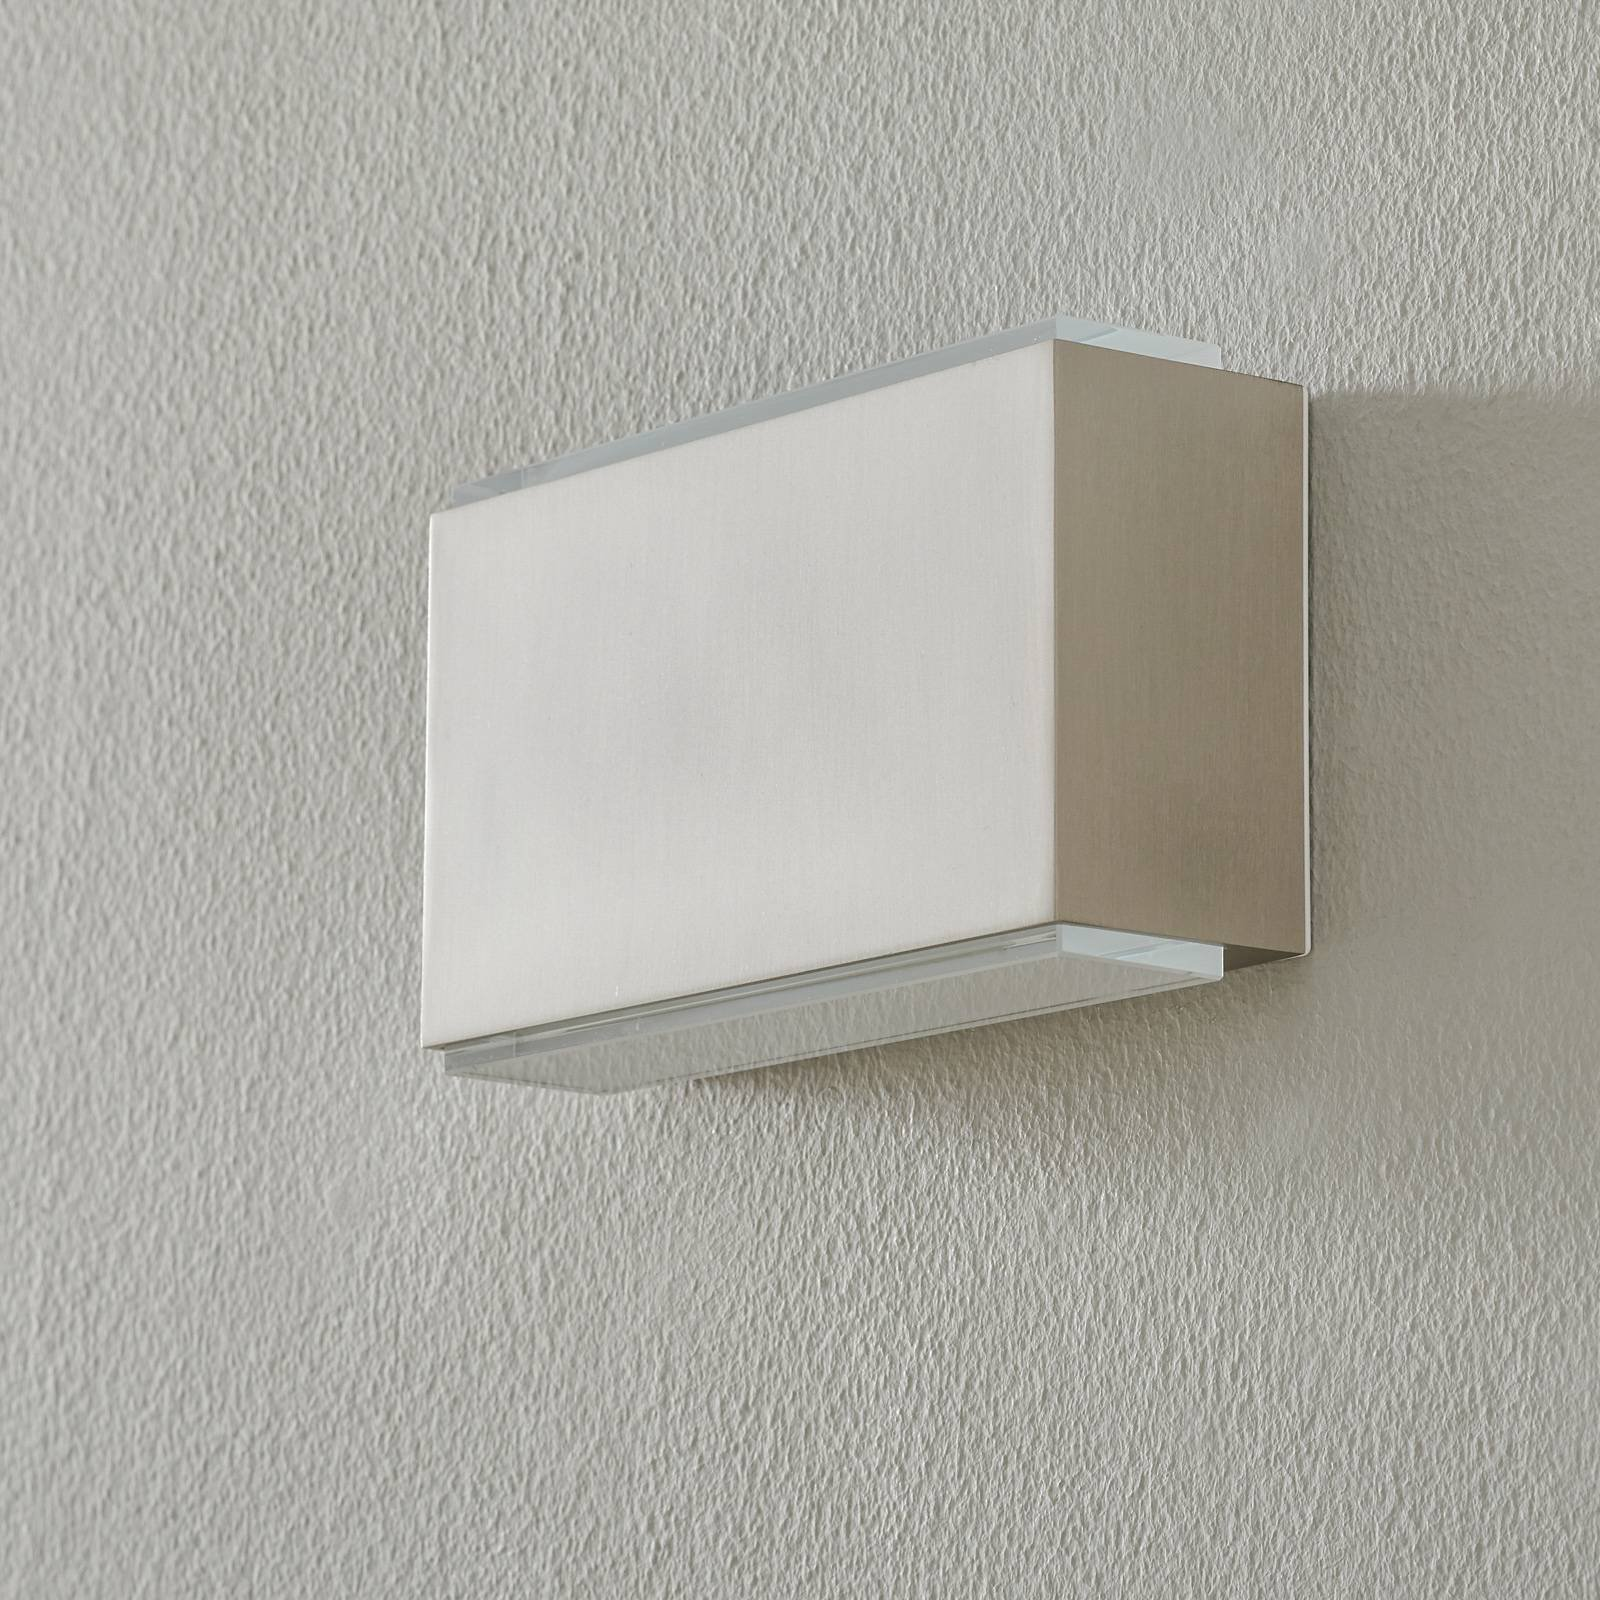 BEGA 23015 LED-vegglampe 3 000 K 18 cm stål 1260lm